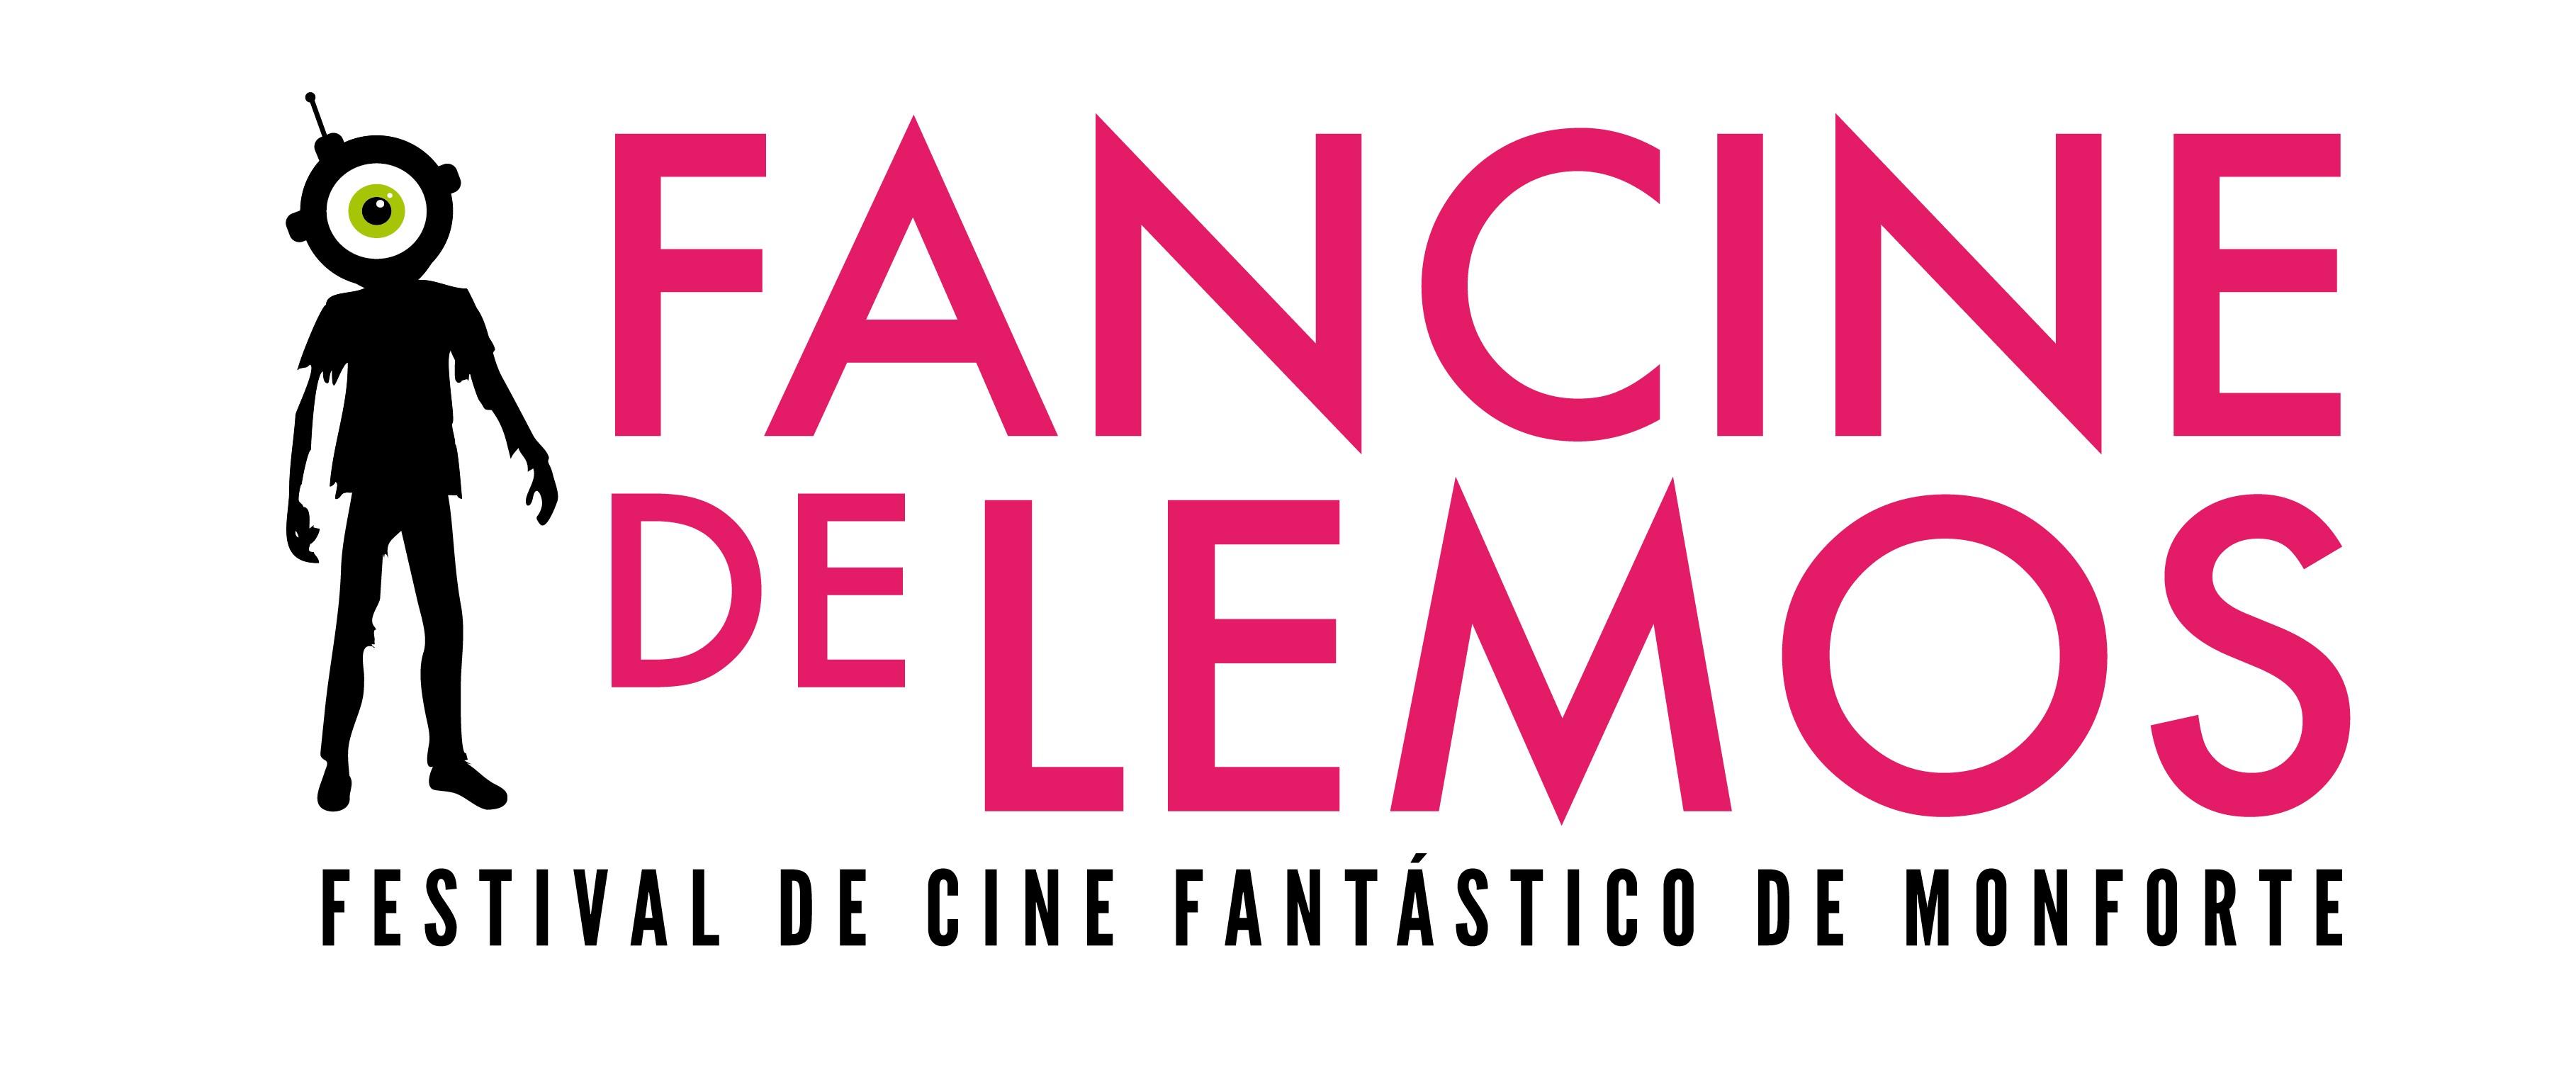 FanCine de Lemos